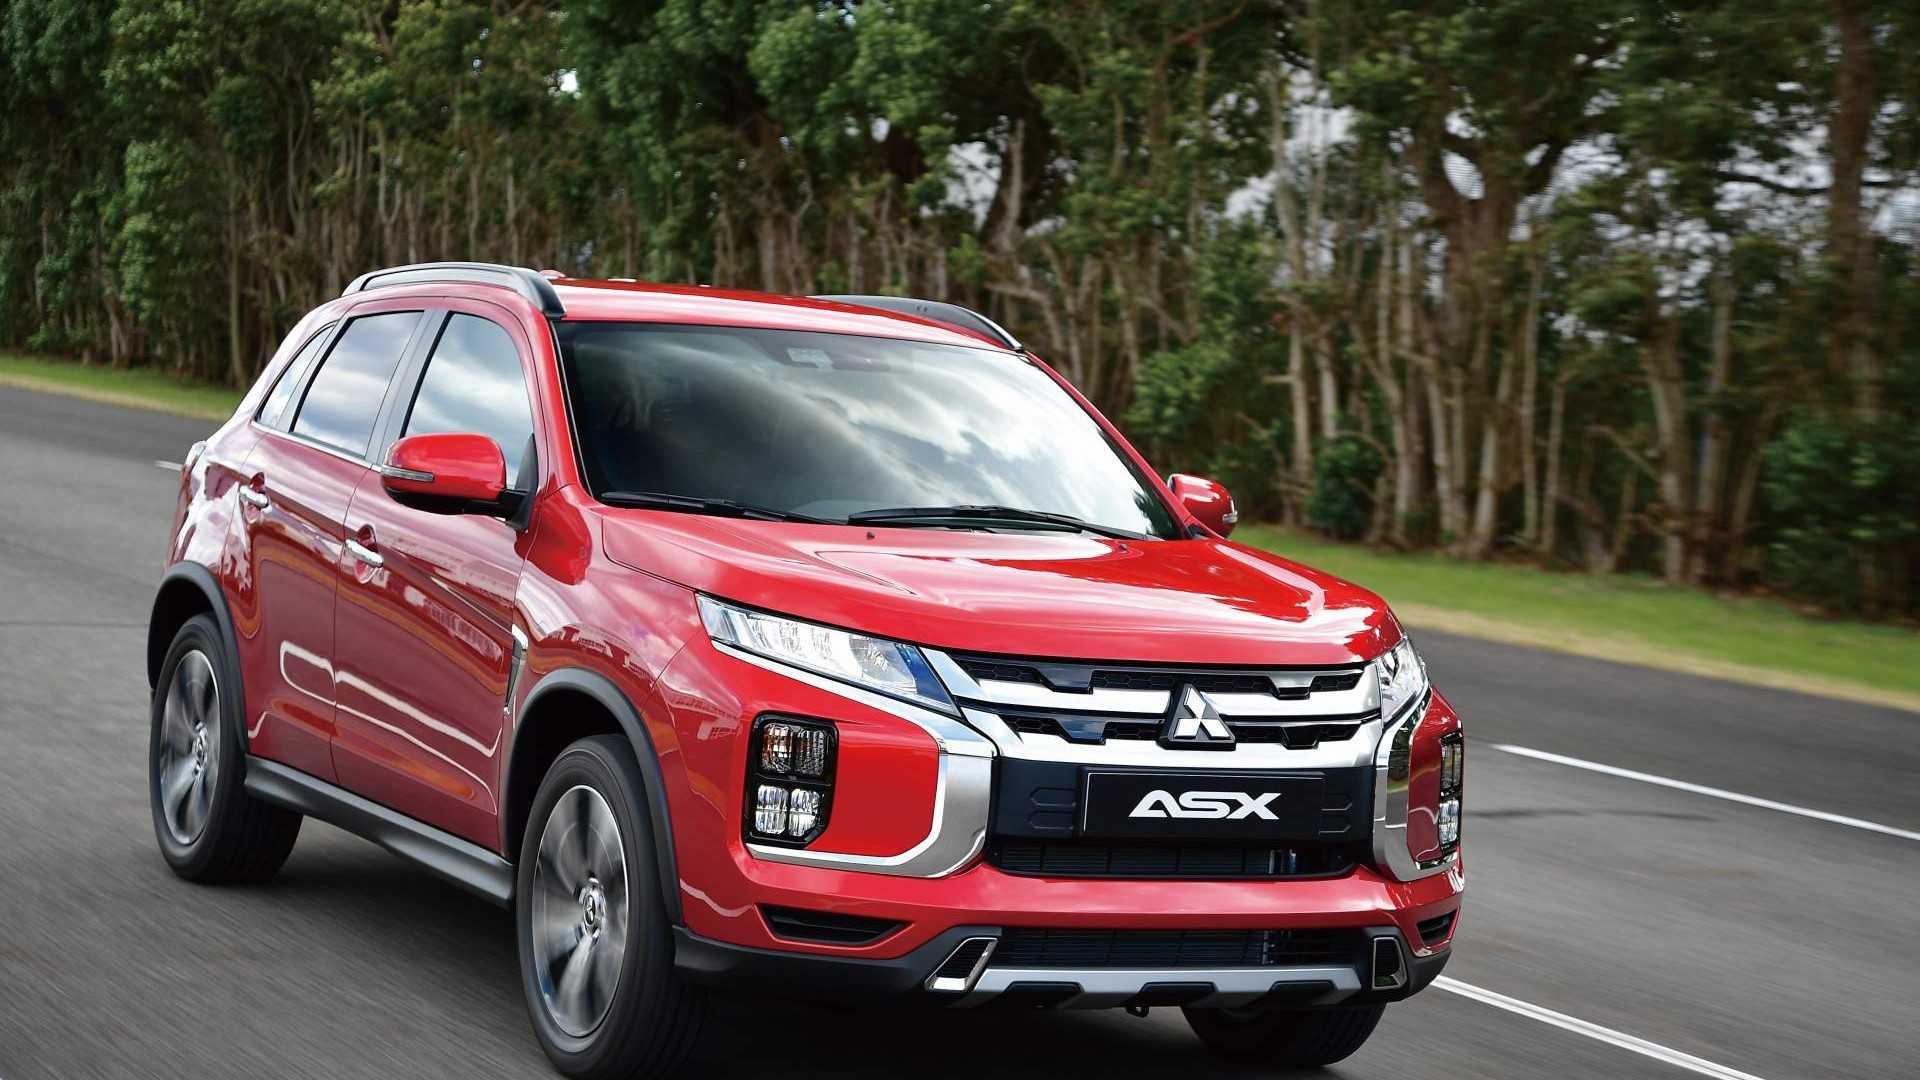 33 Best Review Mitsubishi Asx 2020 Specs Reviews by Mitsubishi Asx 2020 Specs